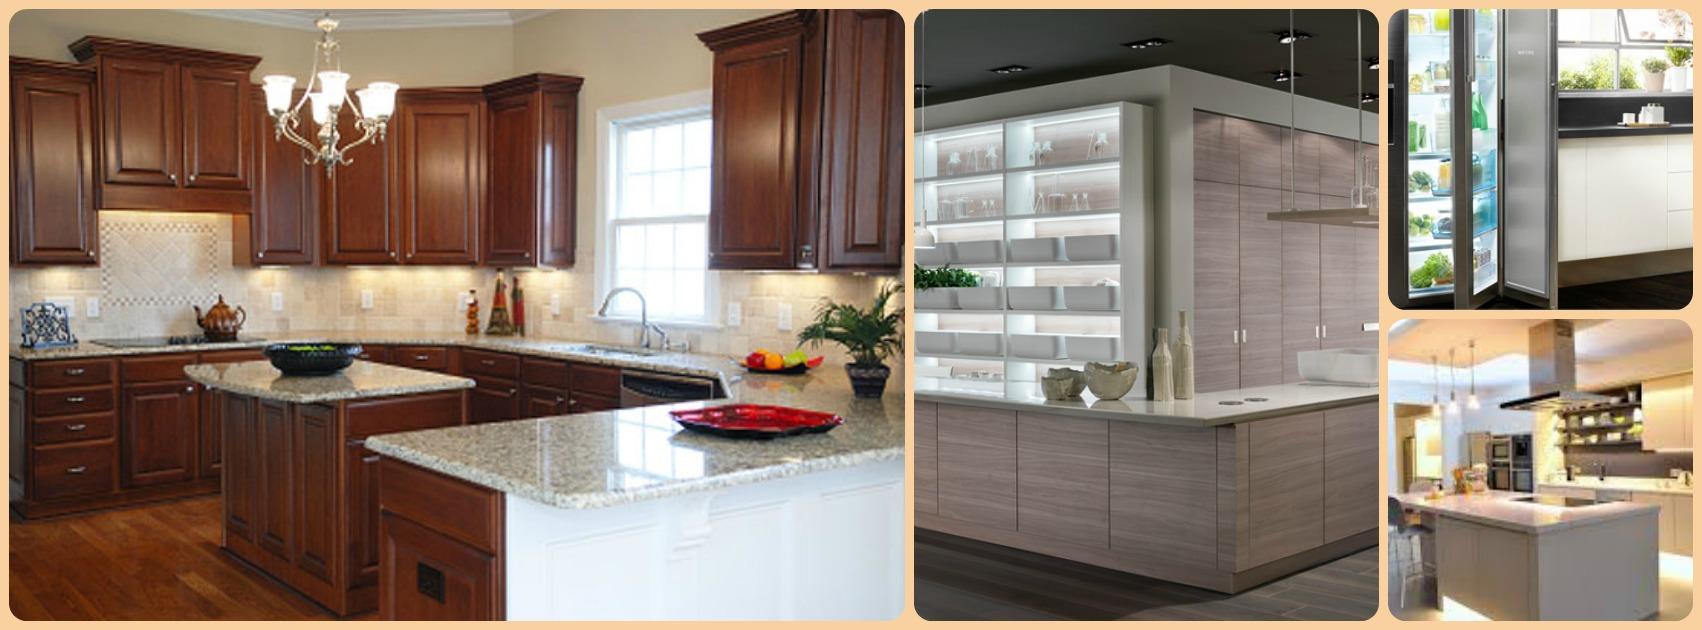 Kitchen & Bathroom remodel Marin County